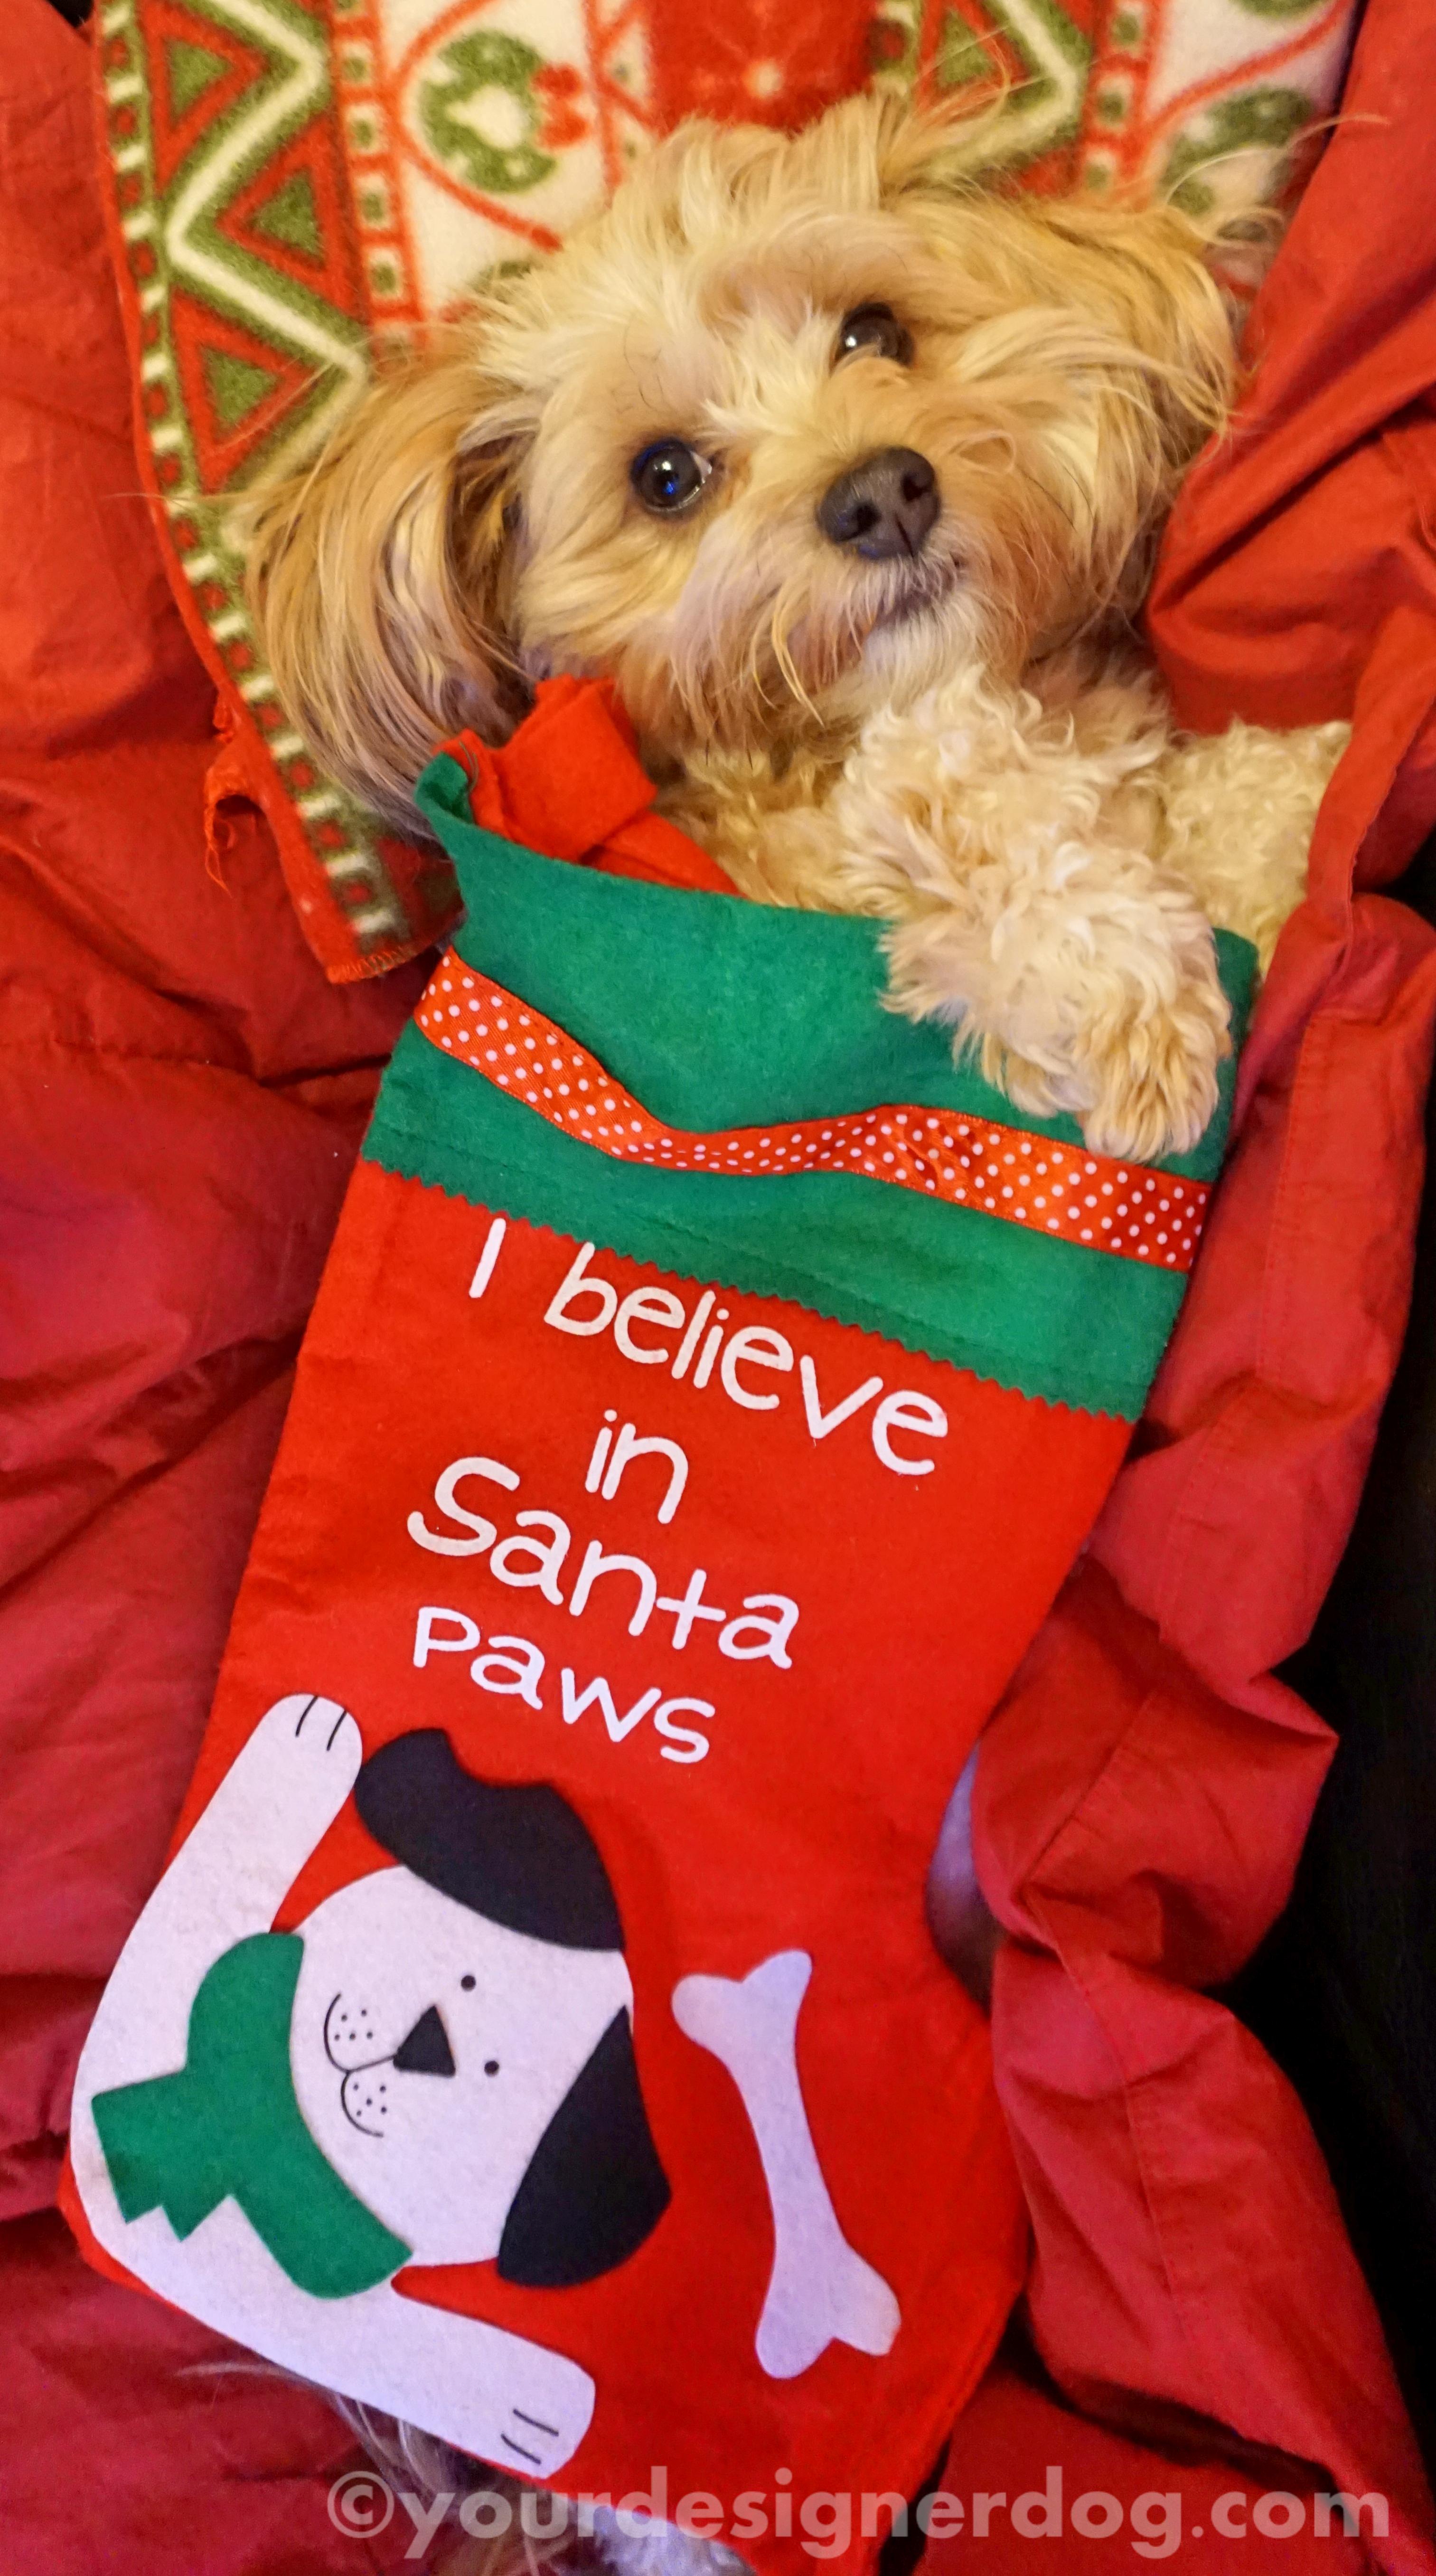 Waiting For Santa Paws…